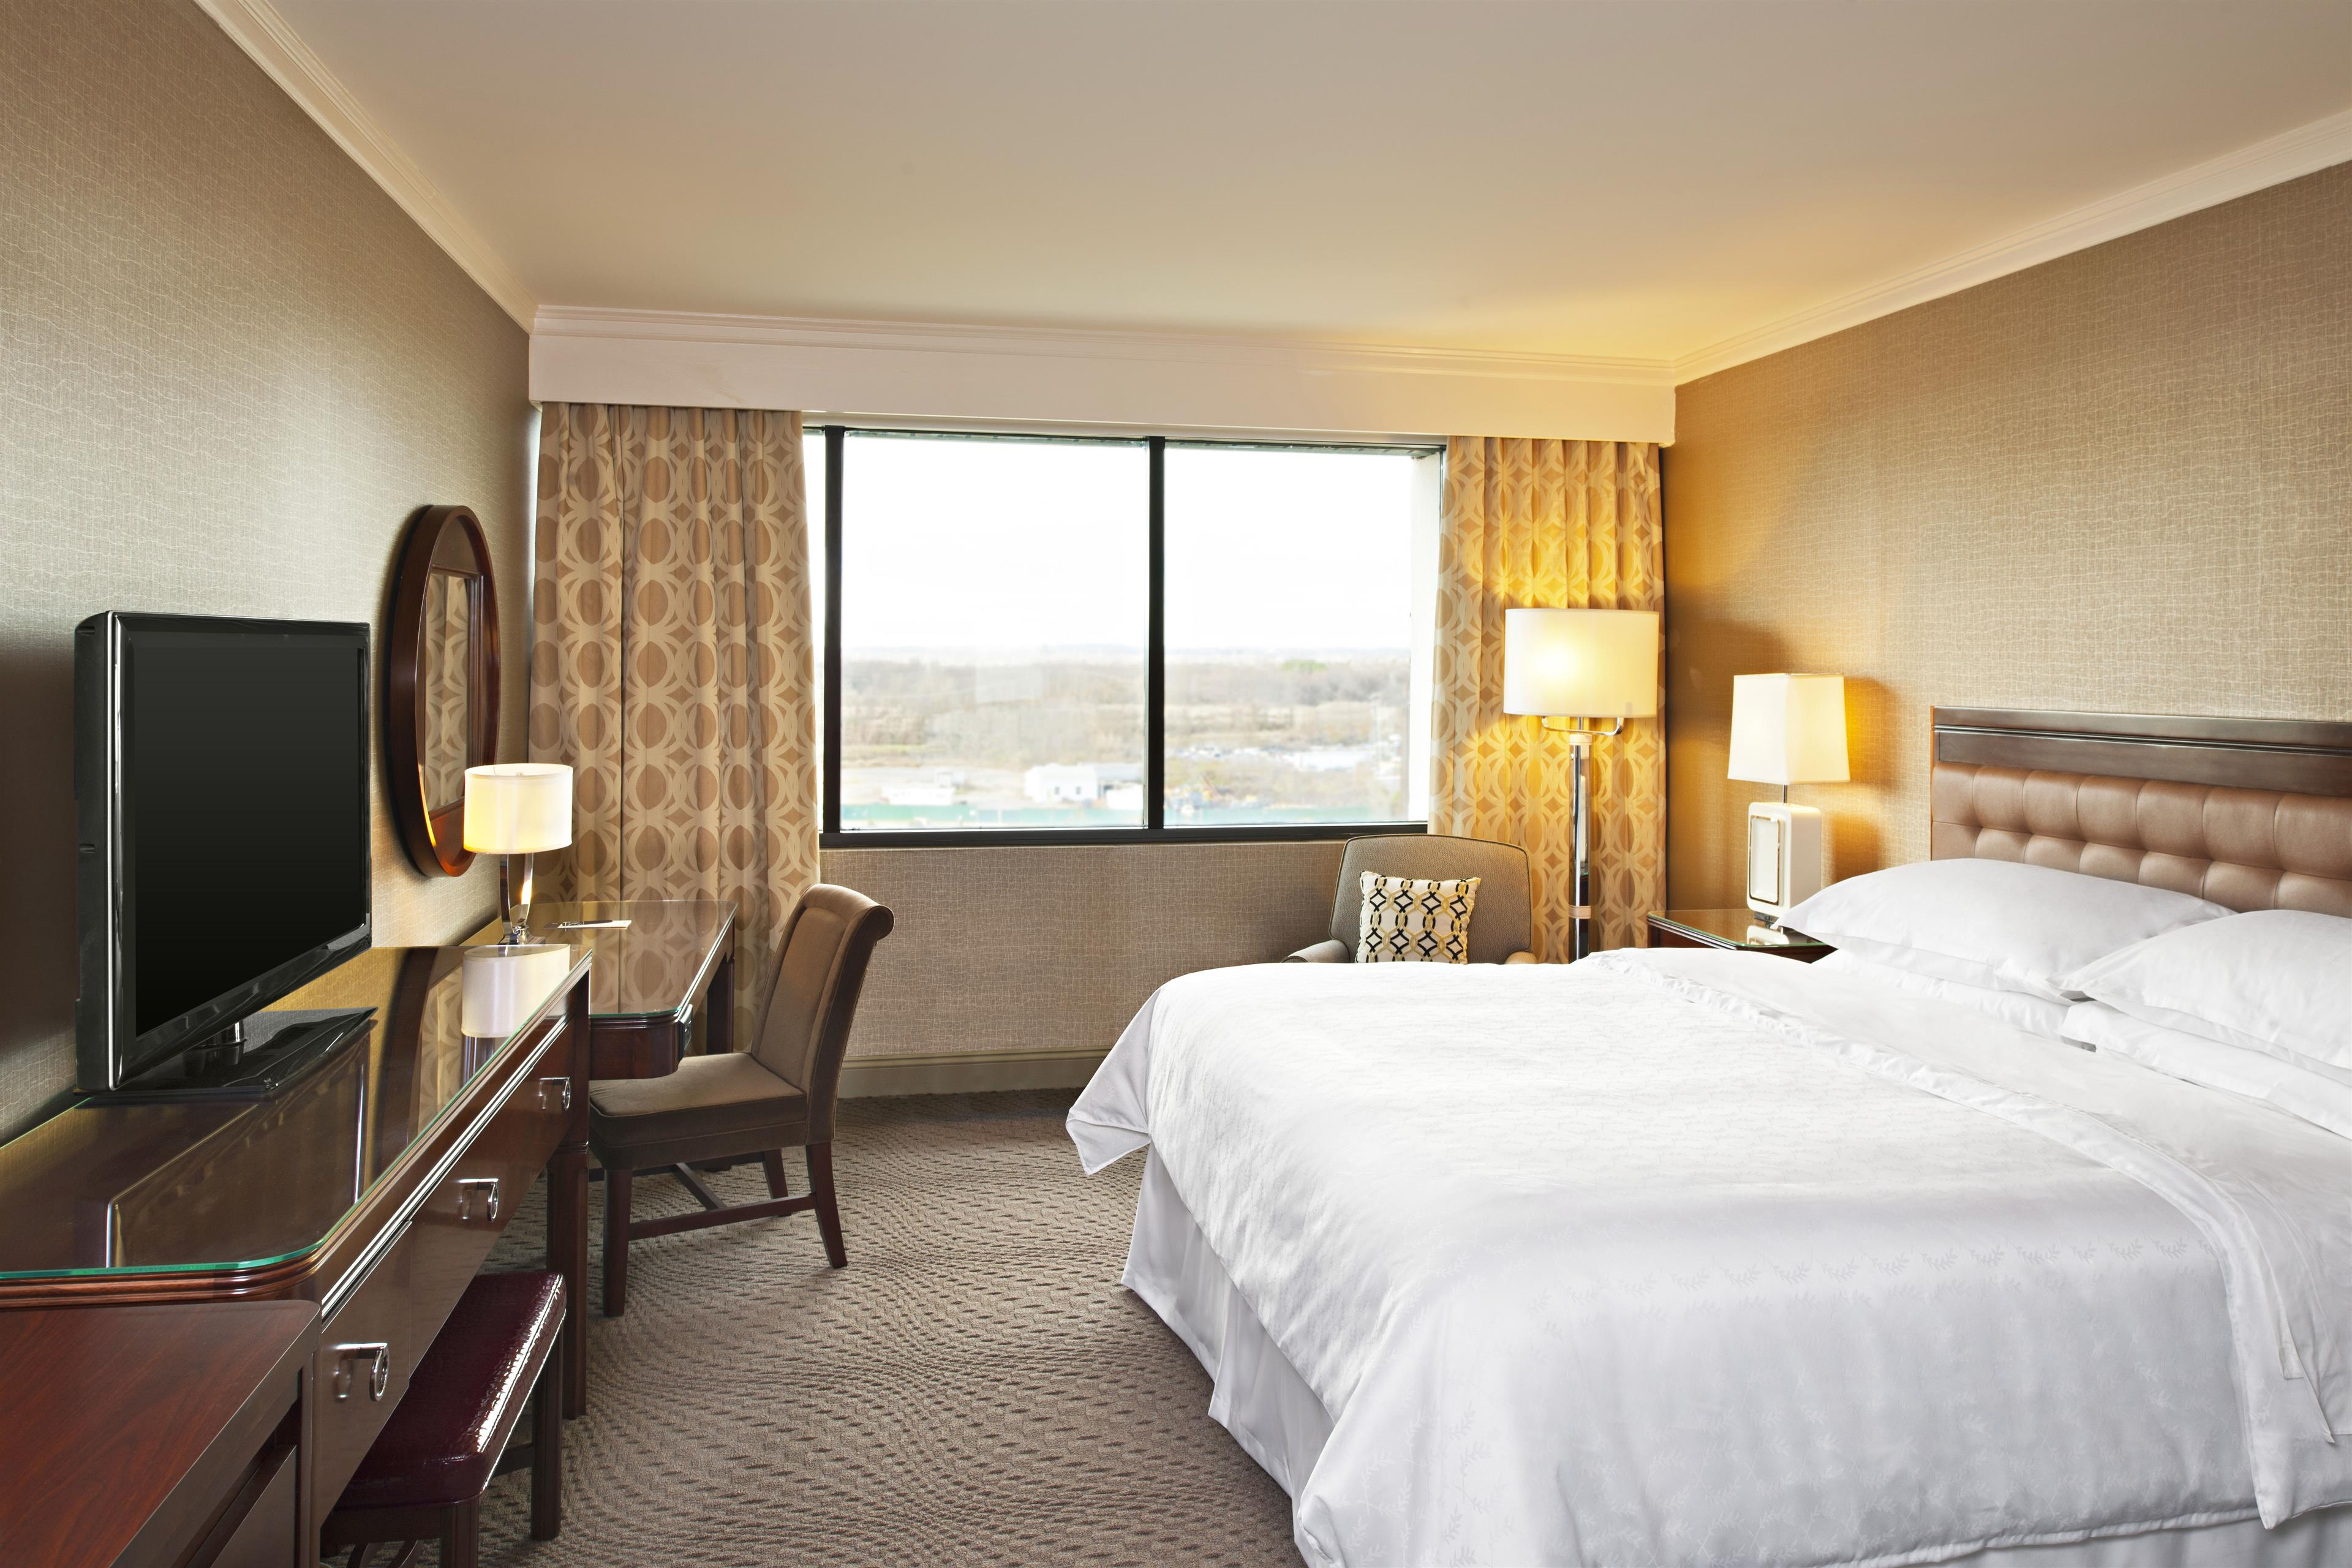 Sheraton Wilmington South Hotel image 14